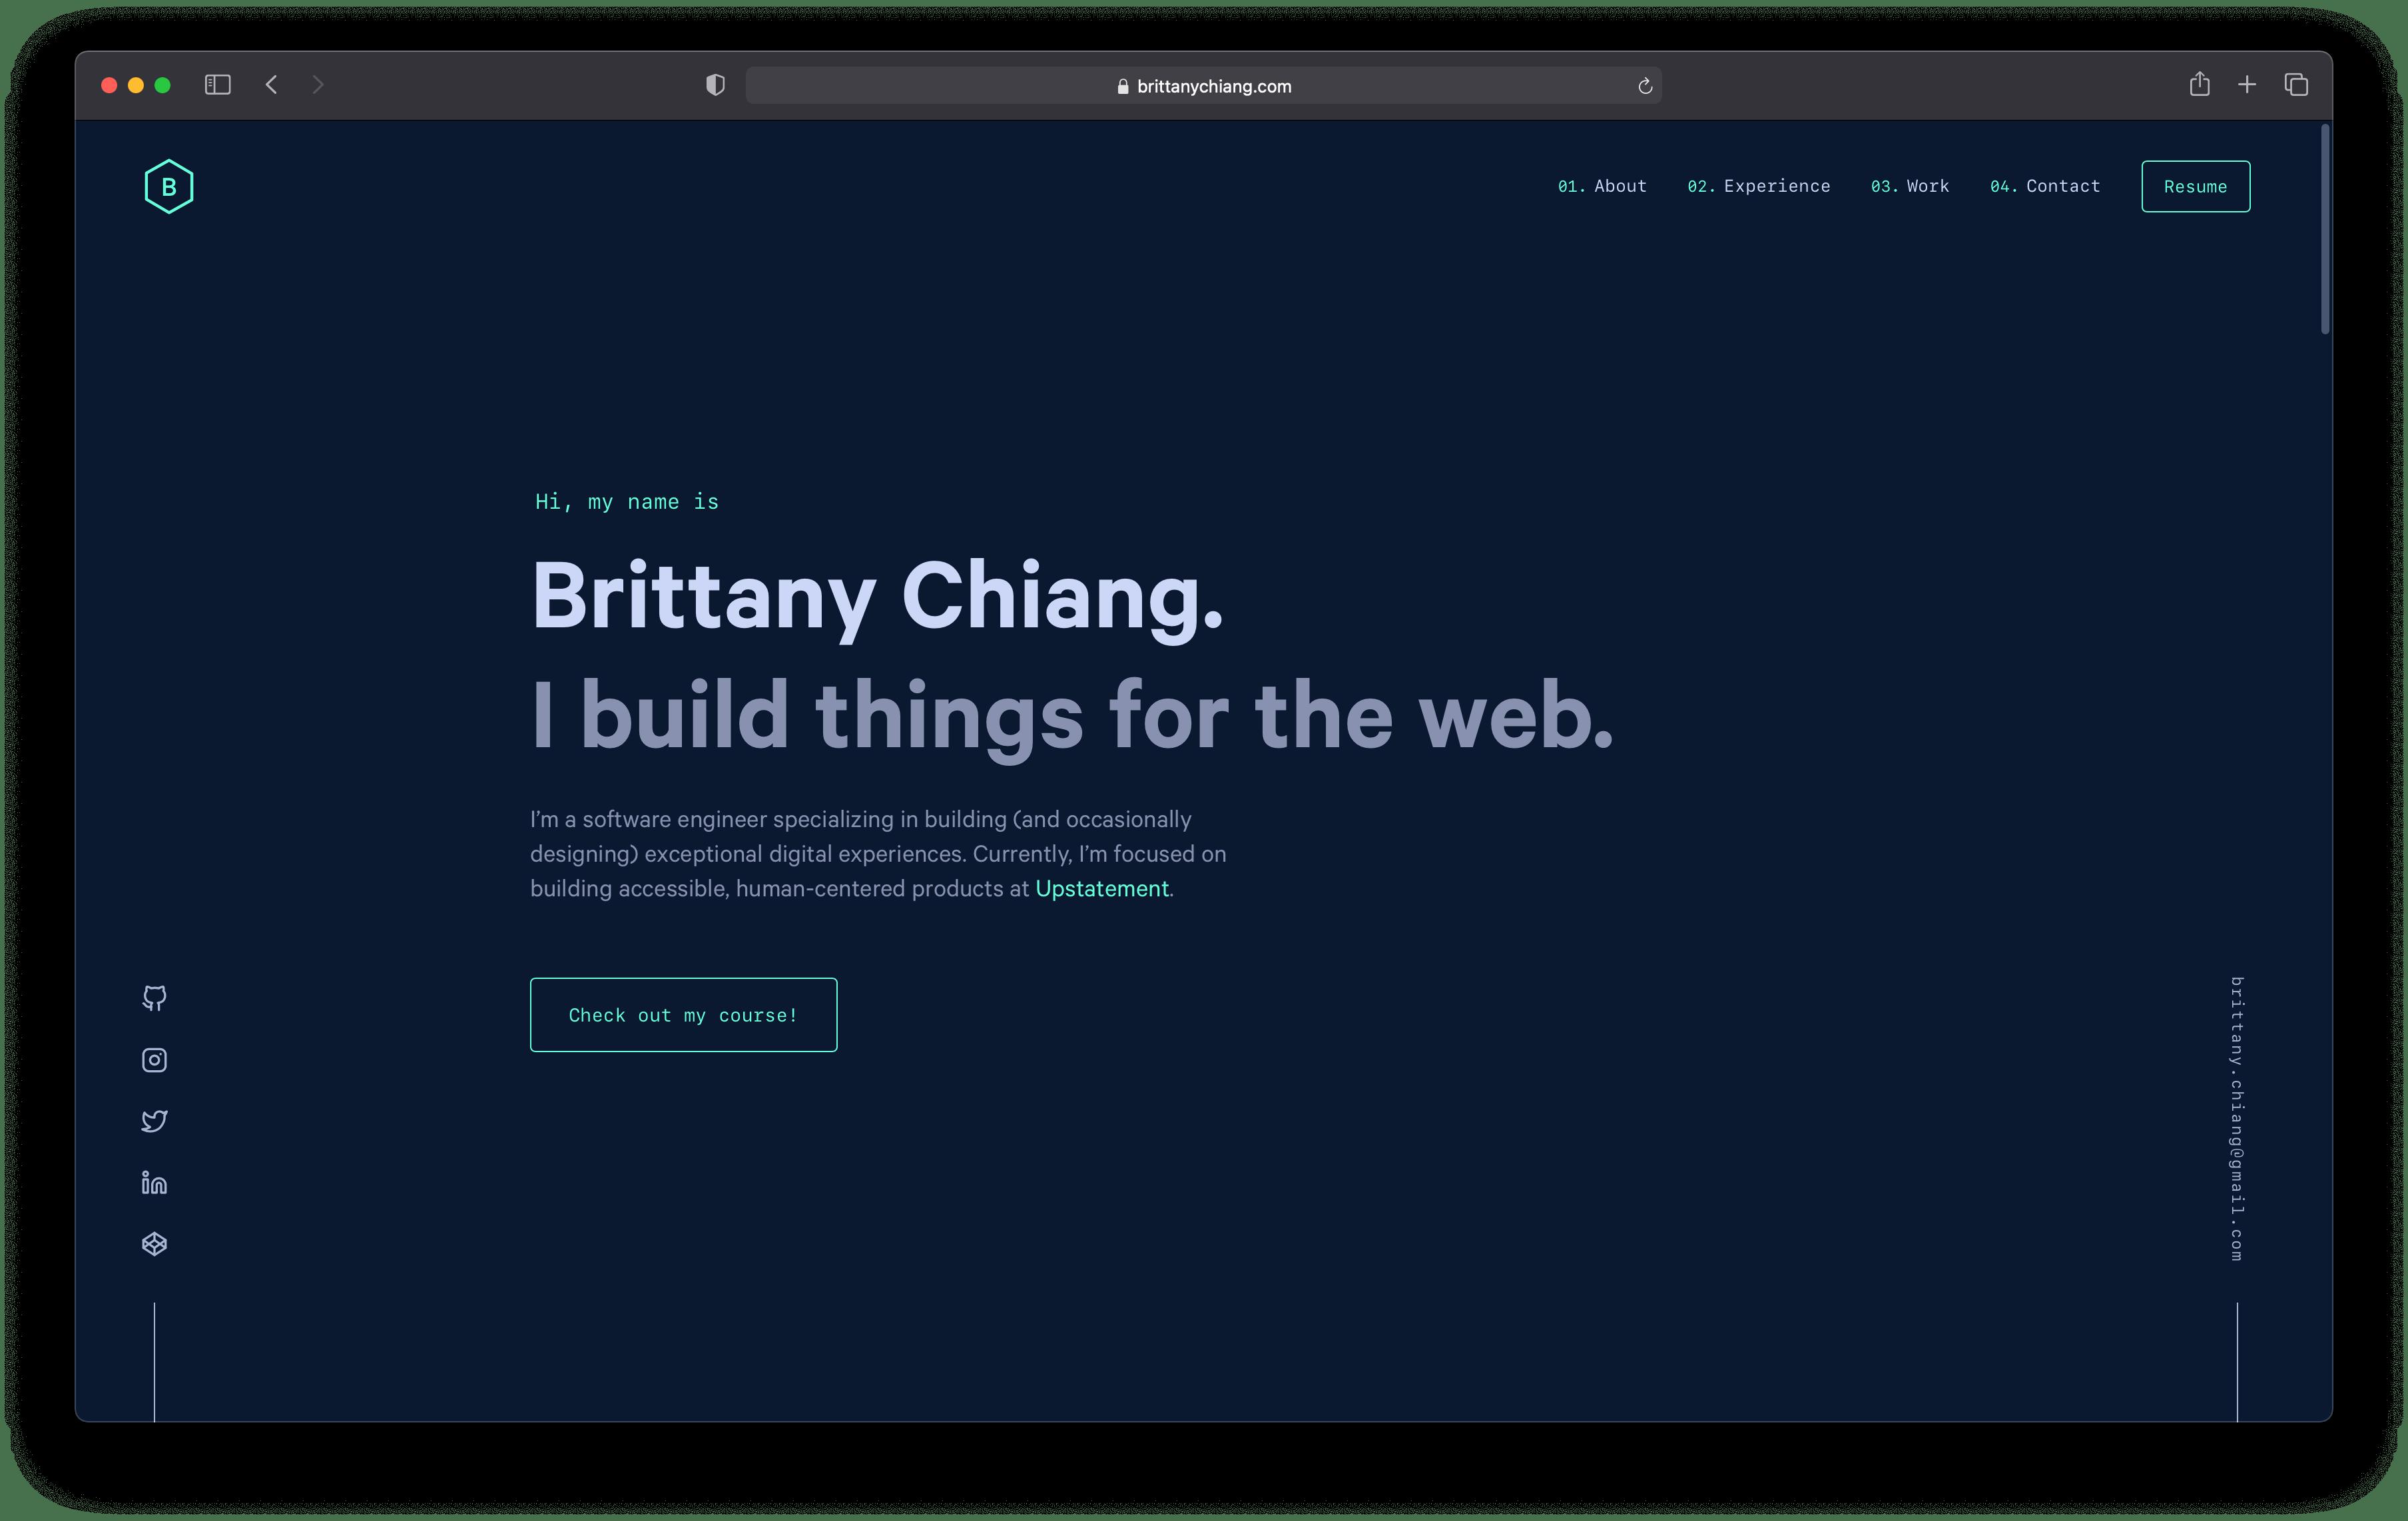 A screenshot of brittanychiang.com website